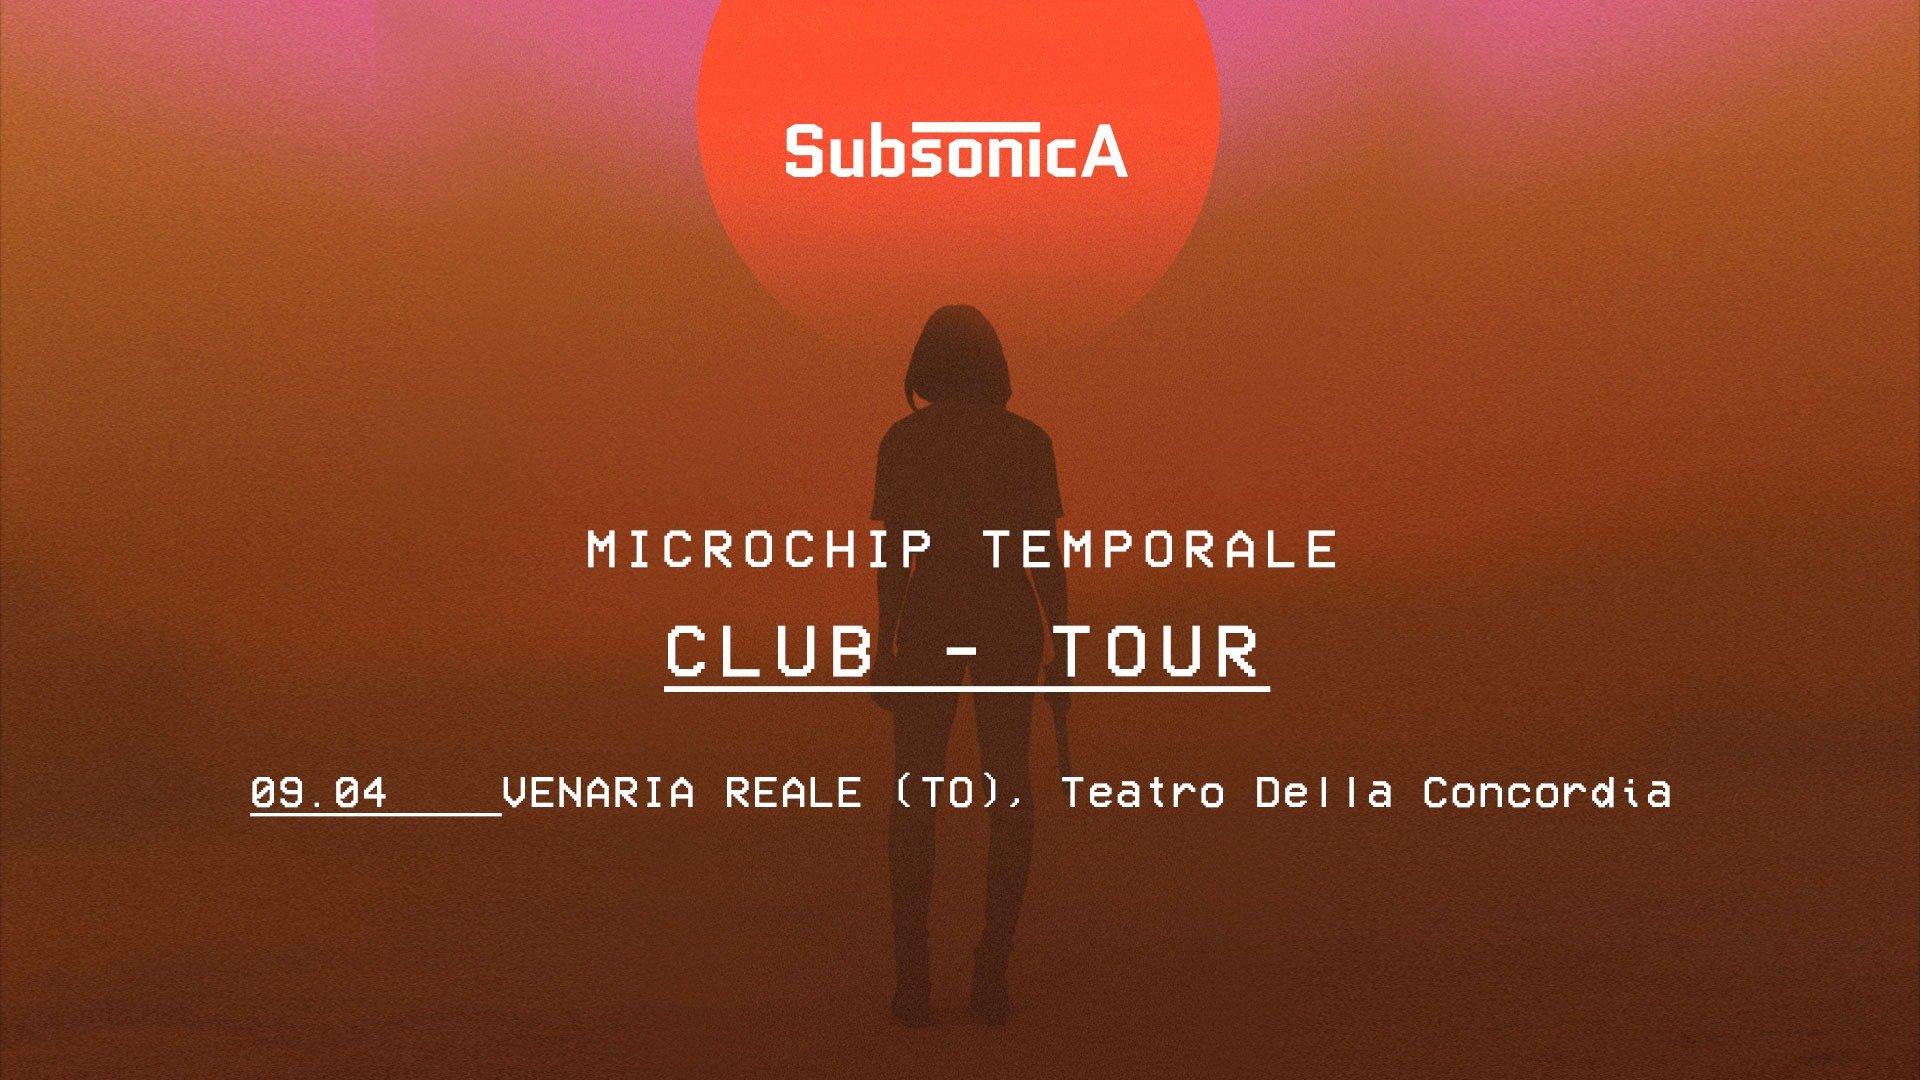 Teatro Concordia Venaria Reale, Subsonica - Microchip Temporale